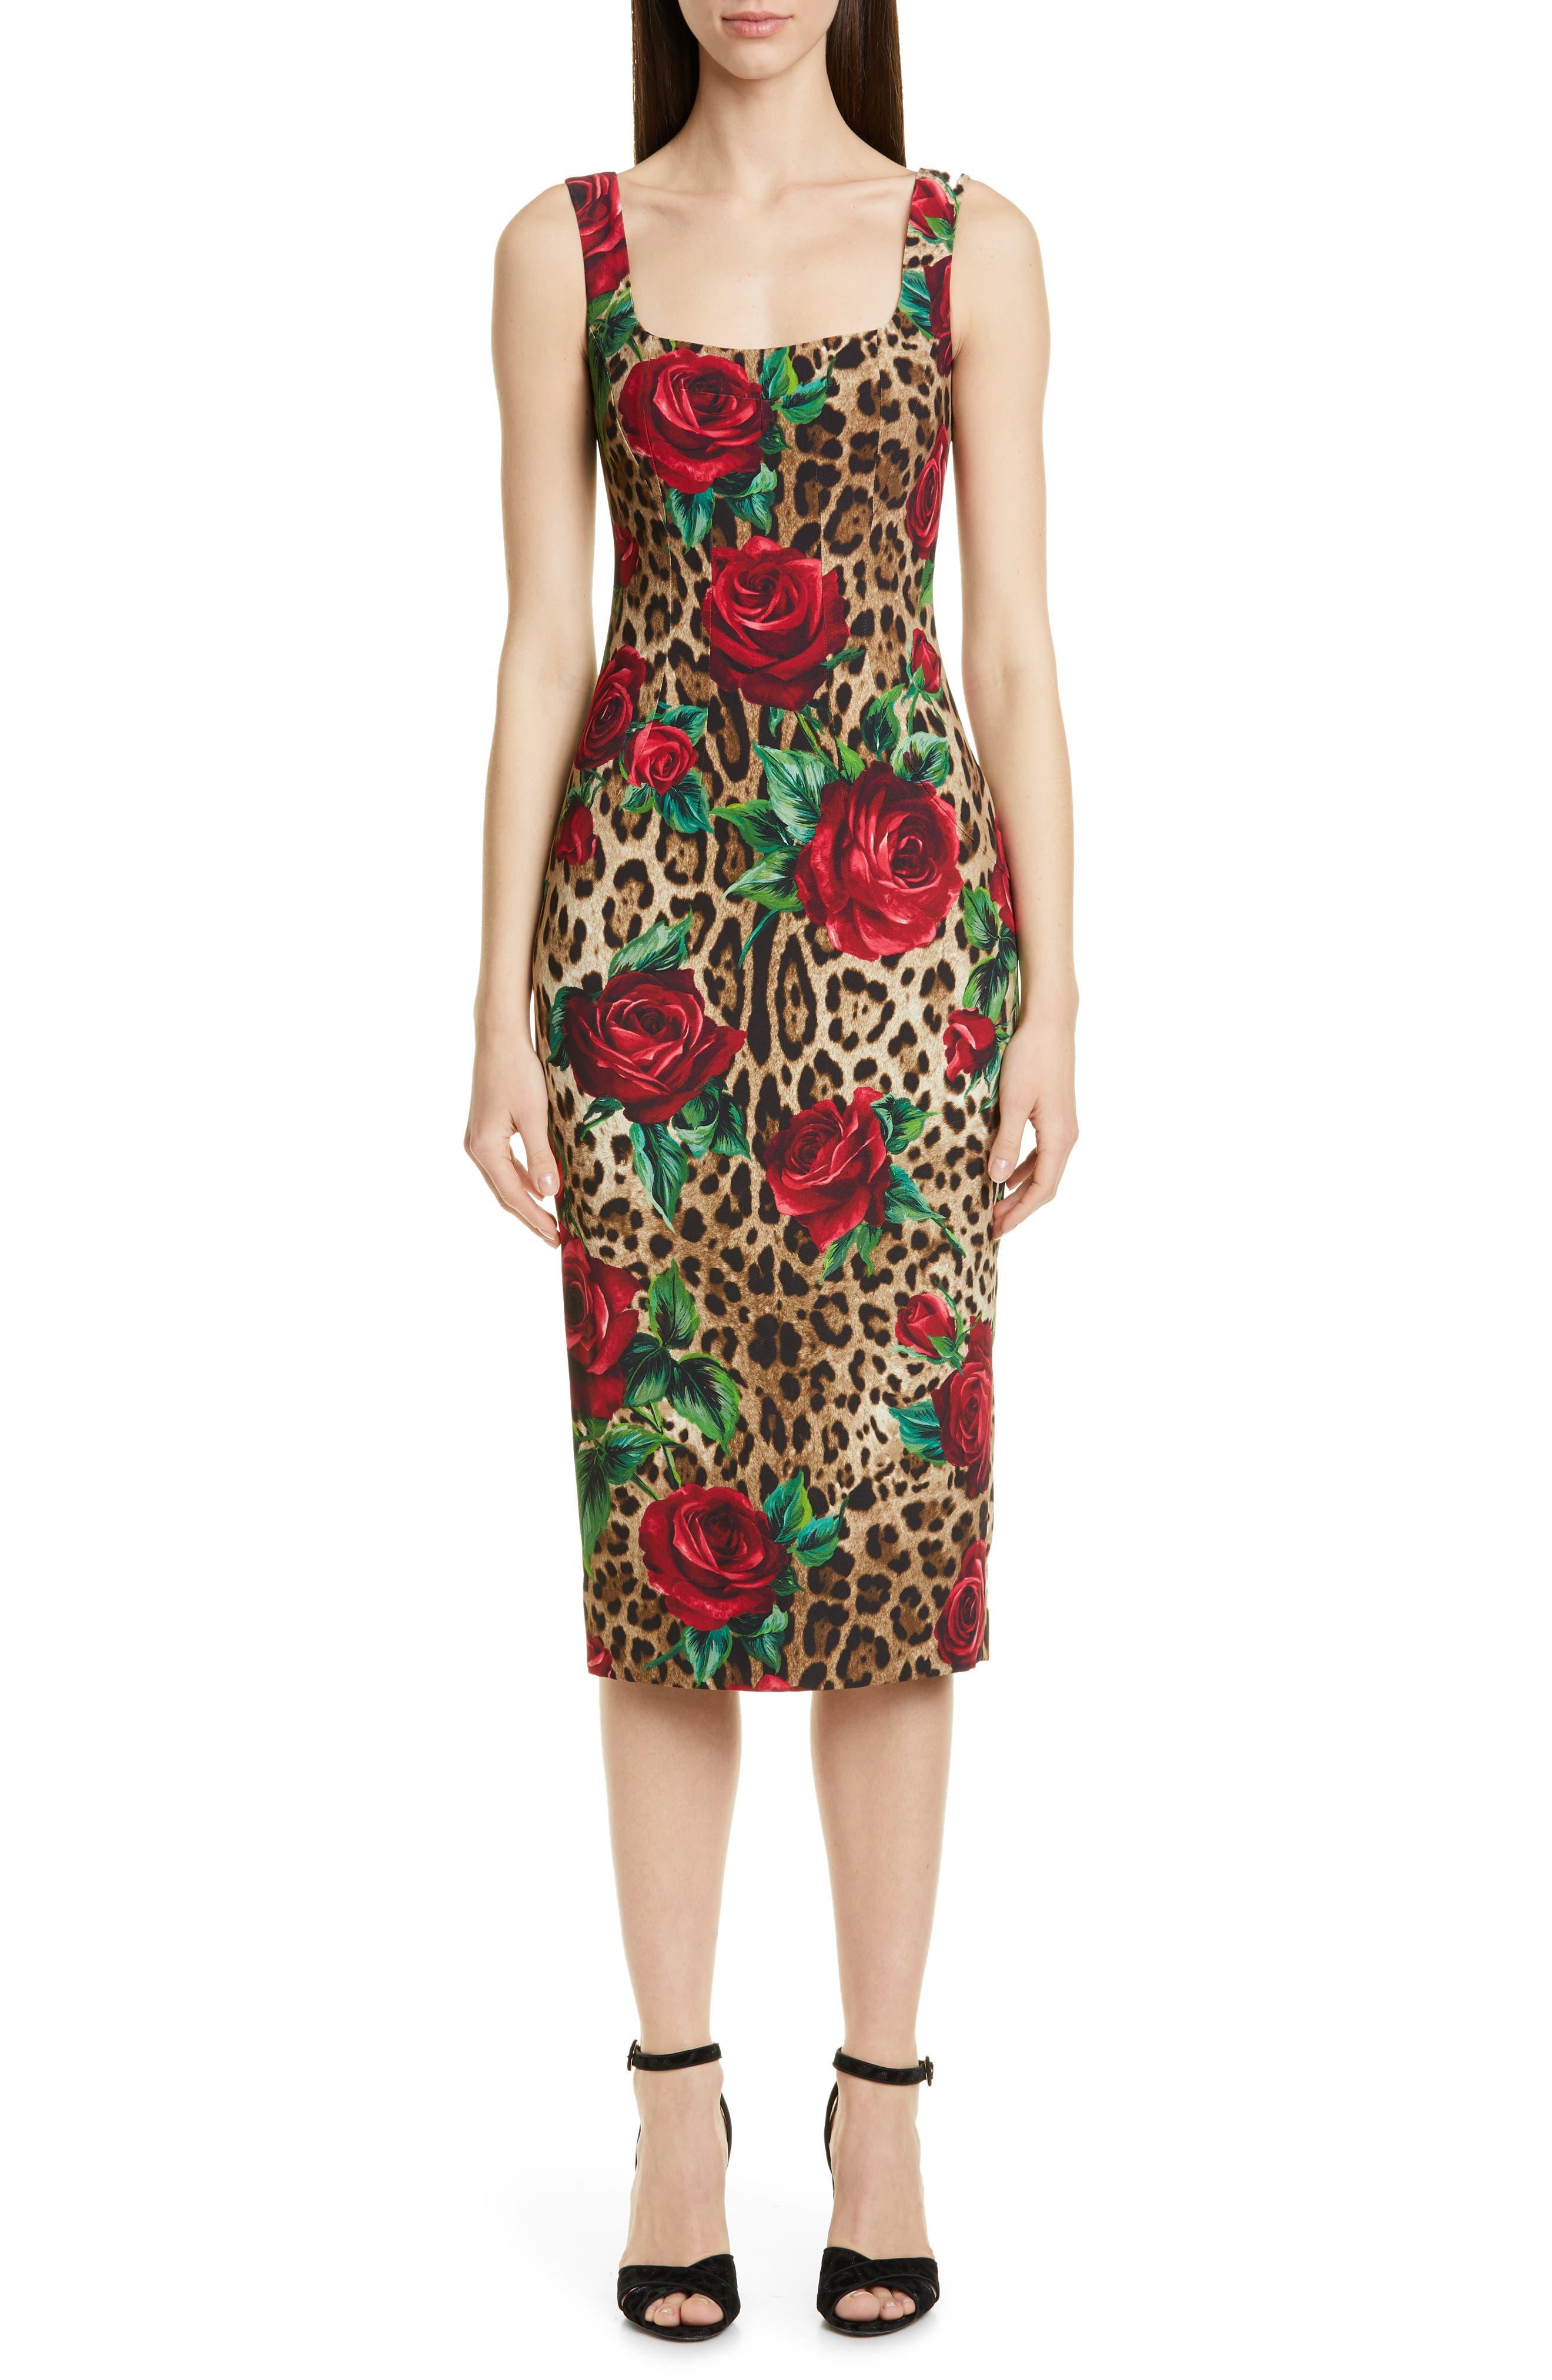 Dolce & gabbana Embellished Rose & Leopard Print Cady Pencil Dress, US / 40 IT - Brown